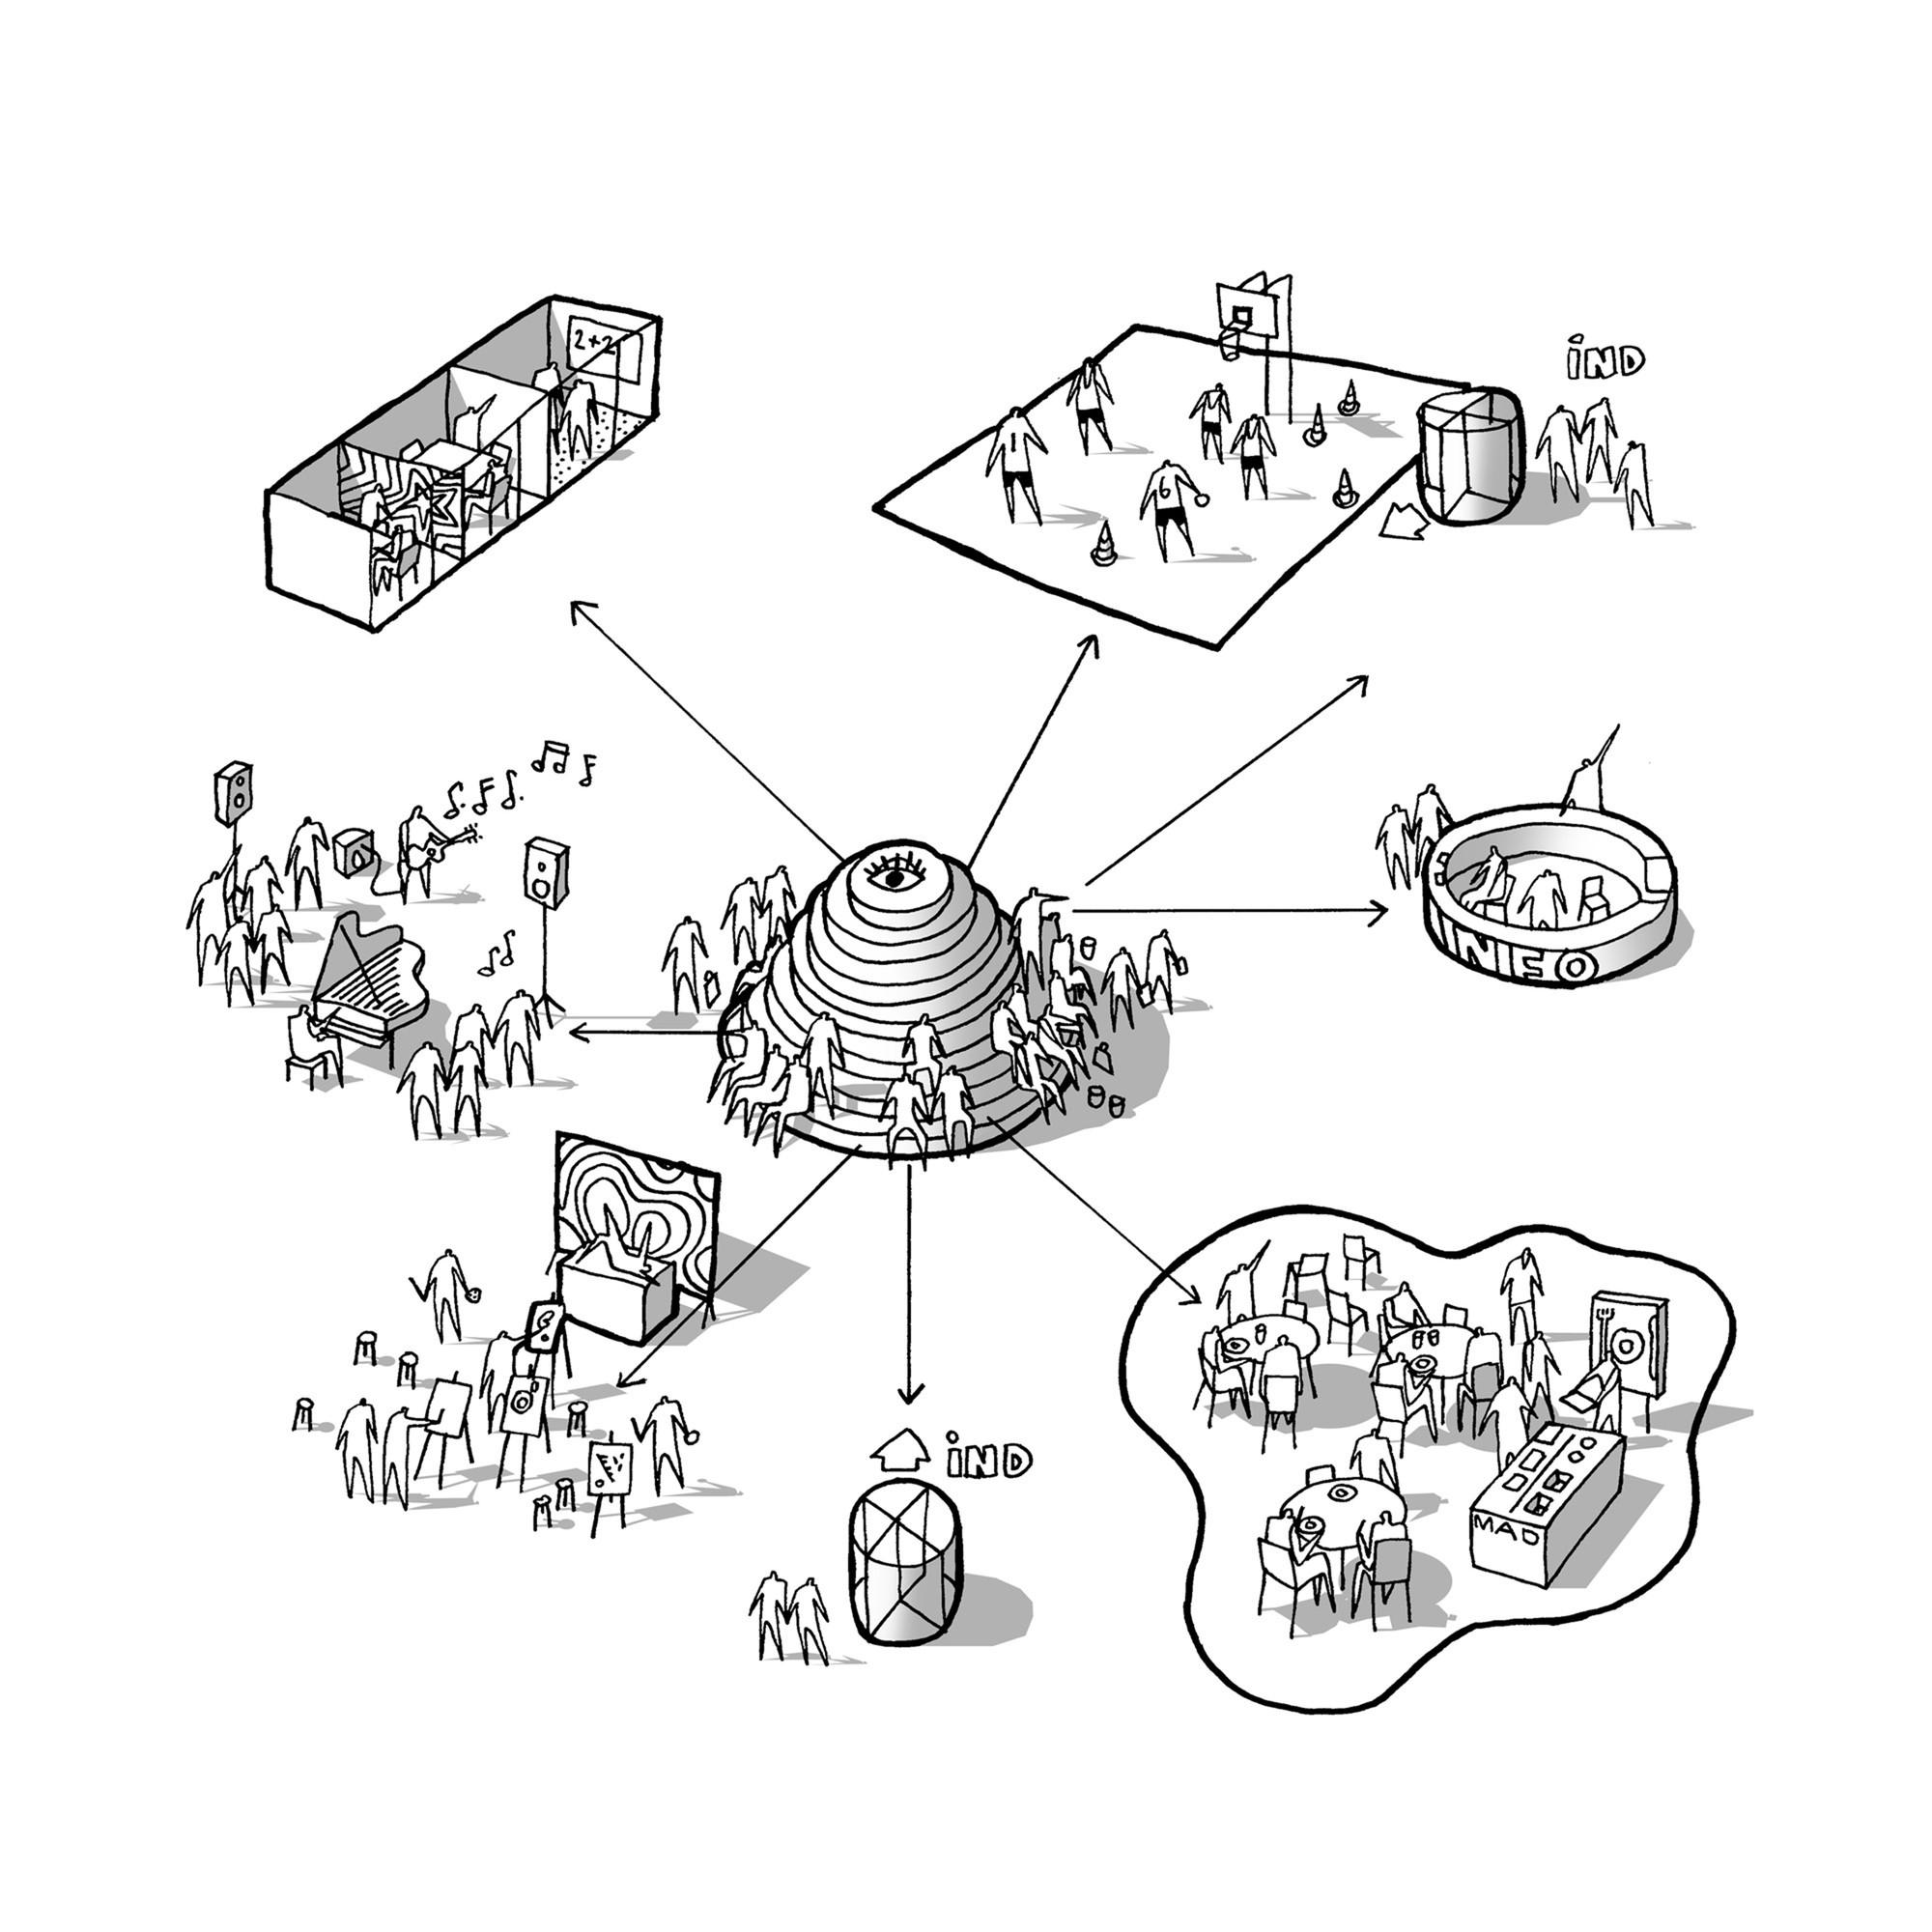 galeria de centro educacional hf & vuc fyn / cebra - 17 frost diagram organic chemistry